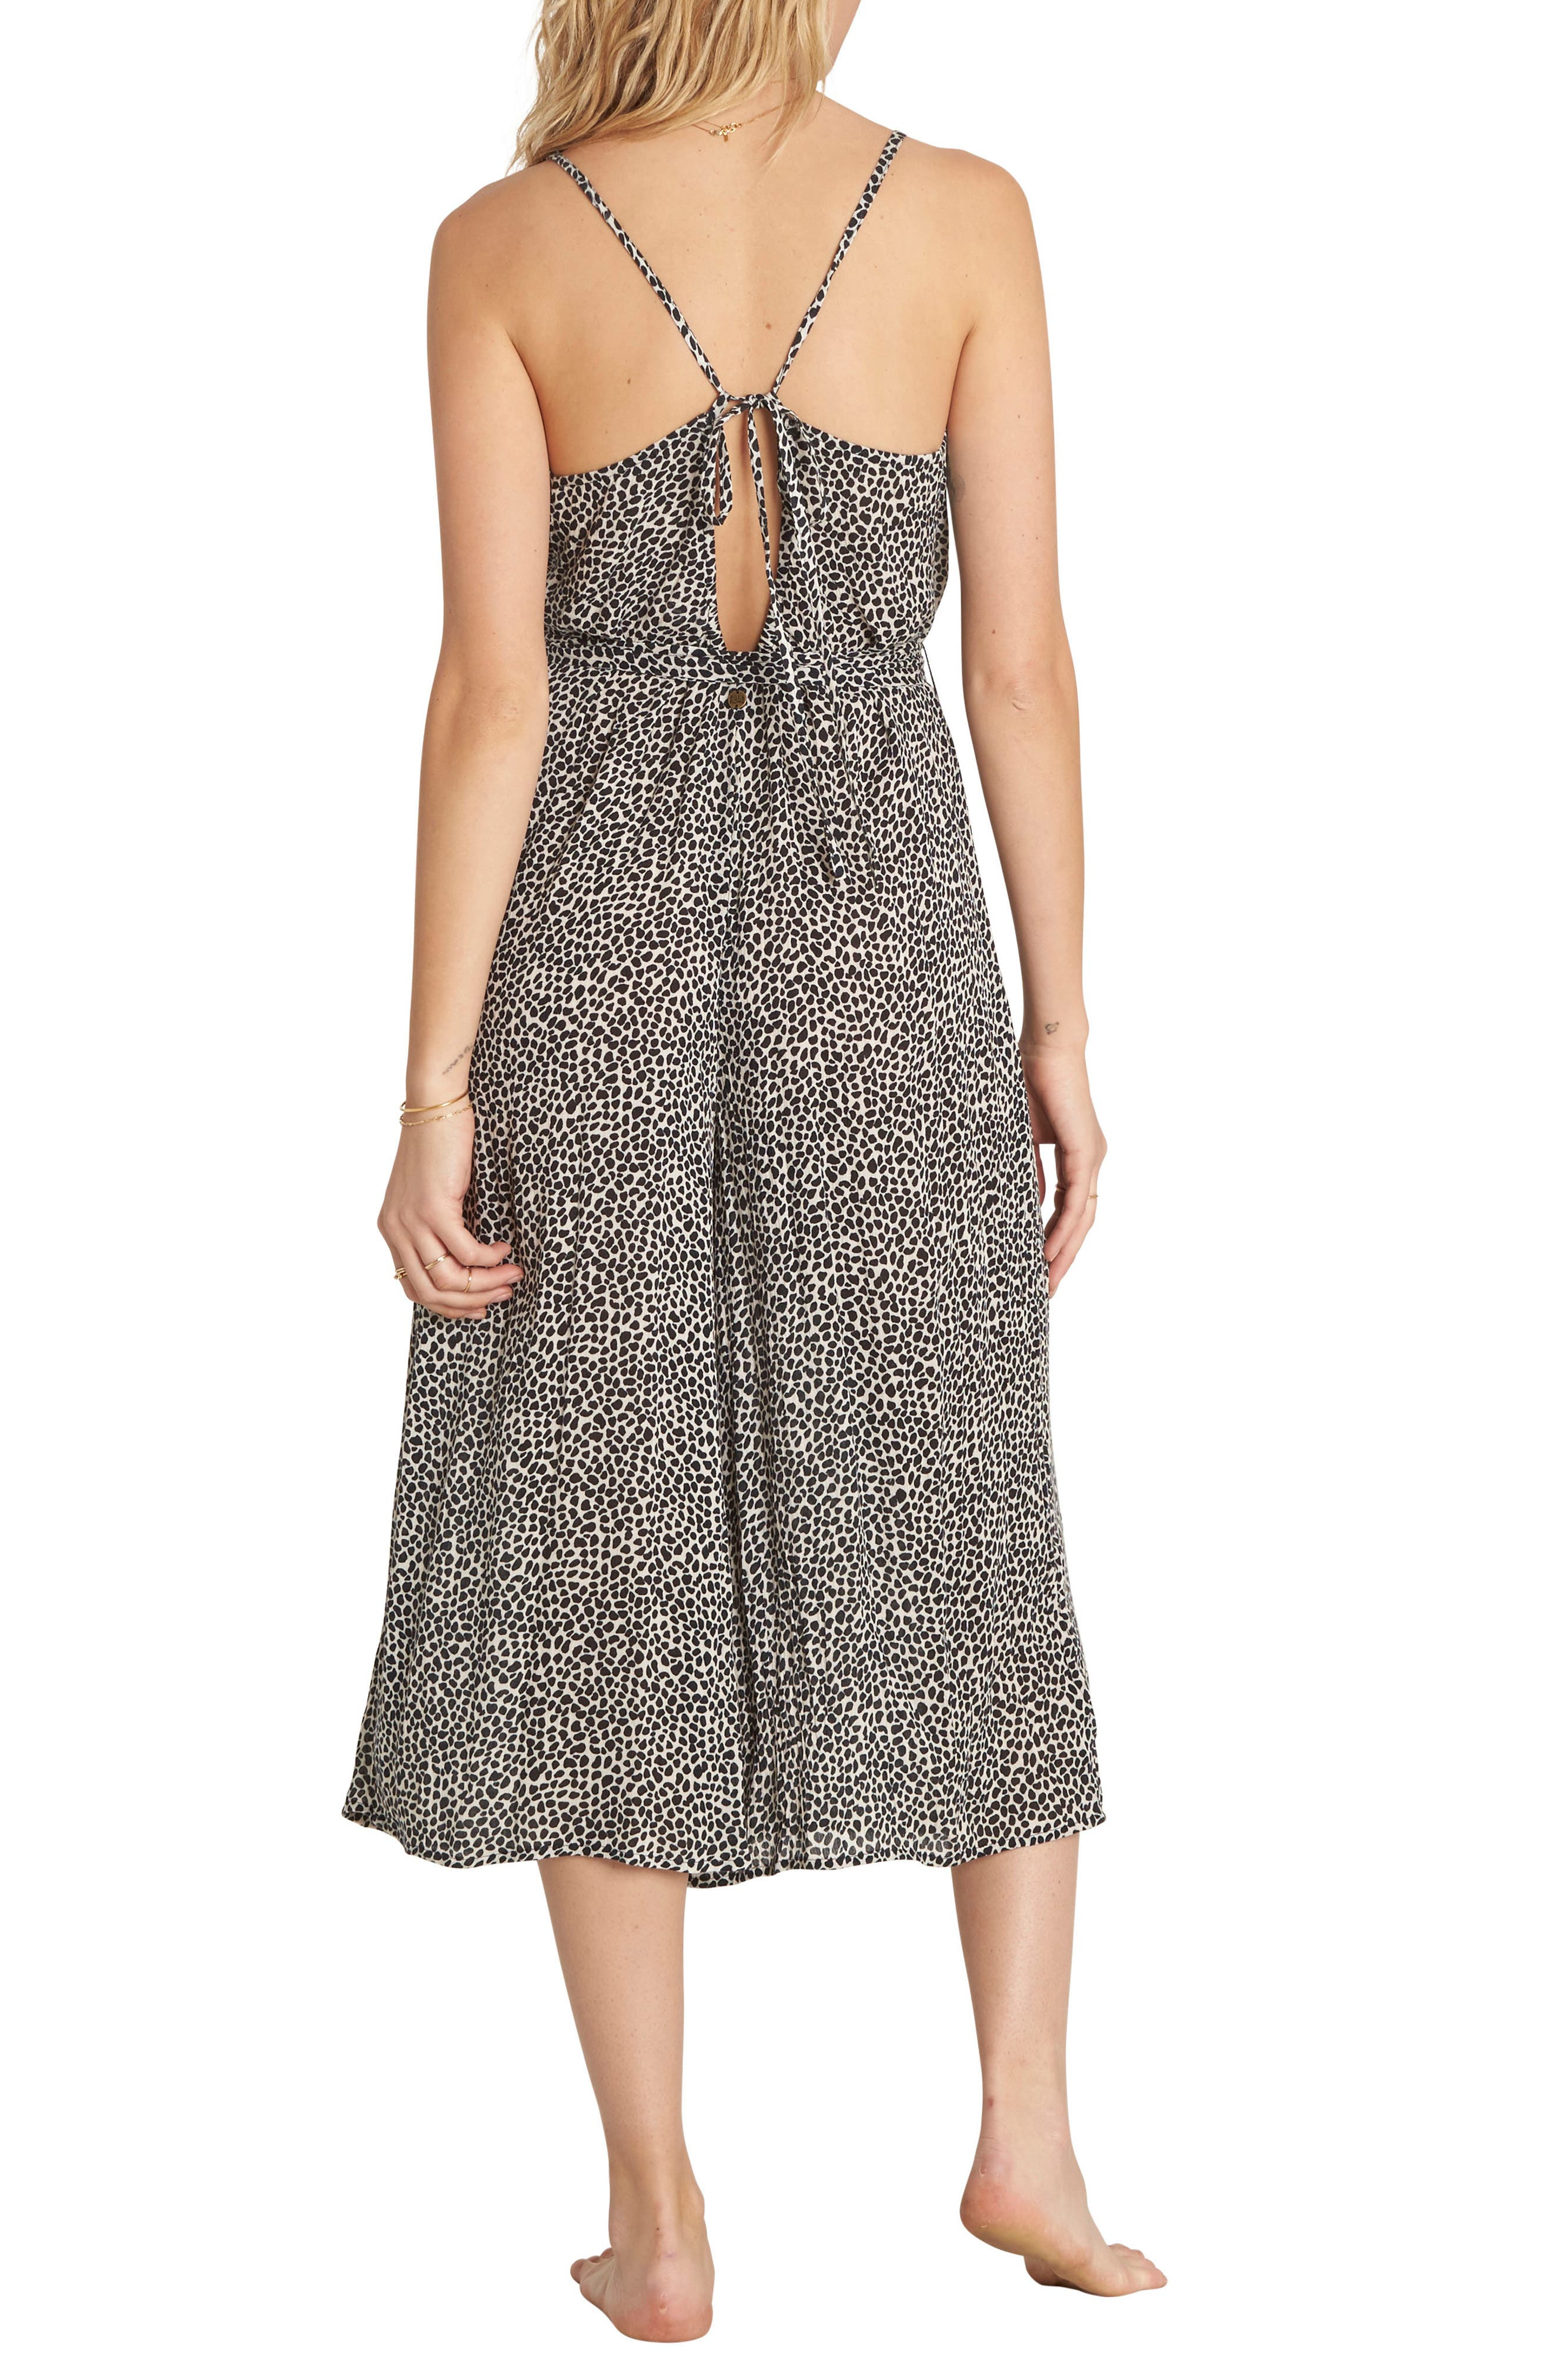 Wild Hearts Tie Waist Midi Dress,                             Alternate thumbnail 2, color,                             900